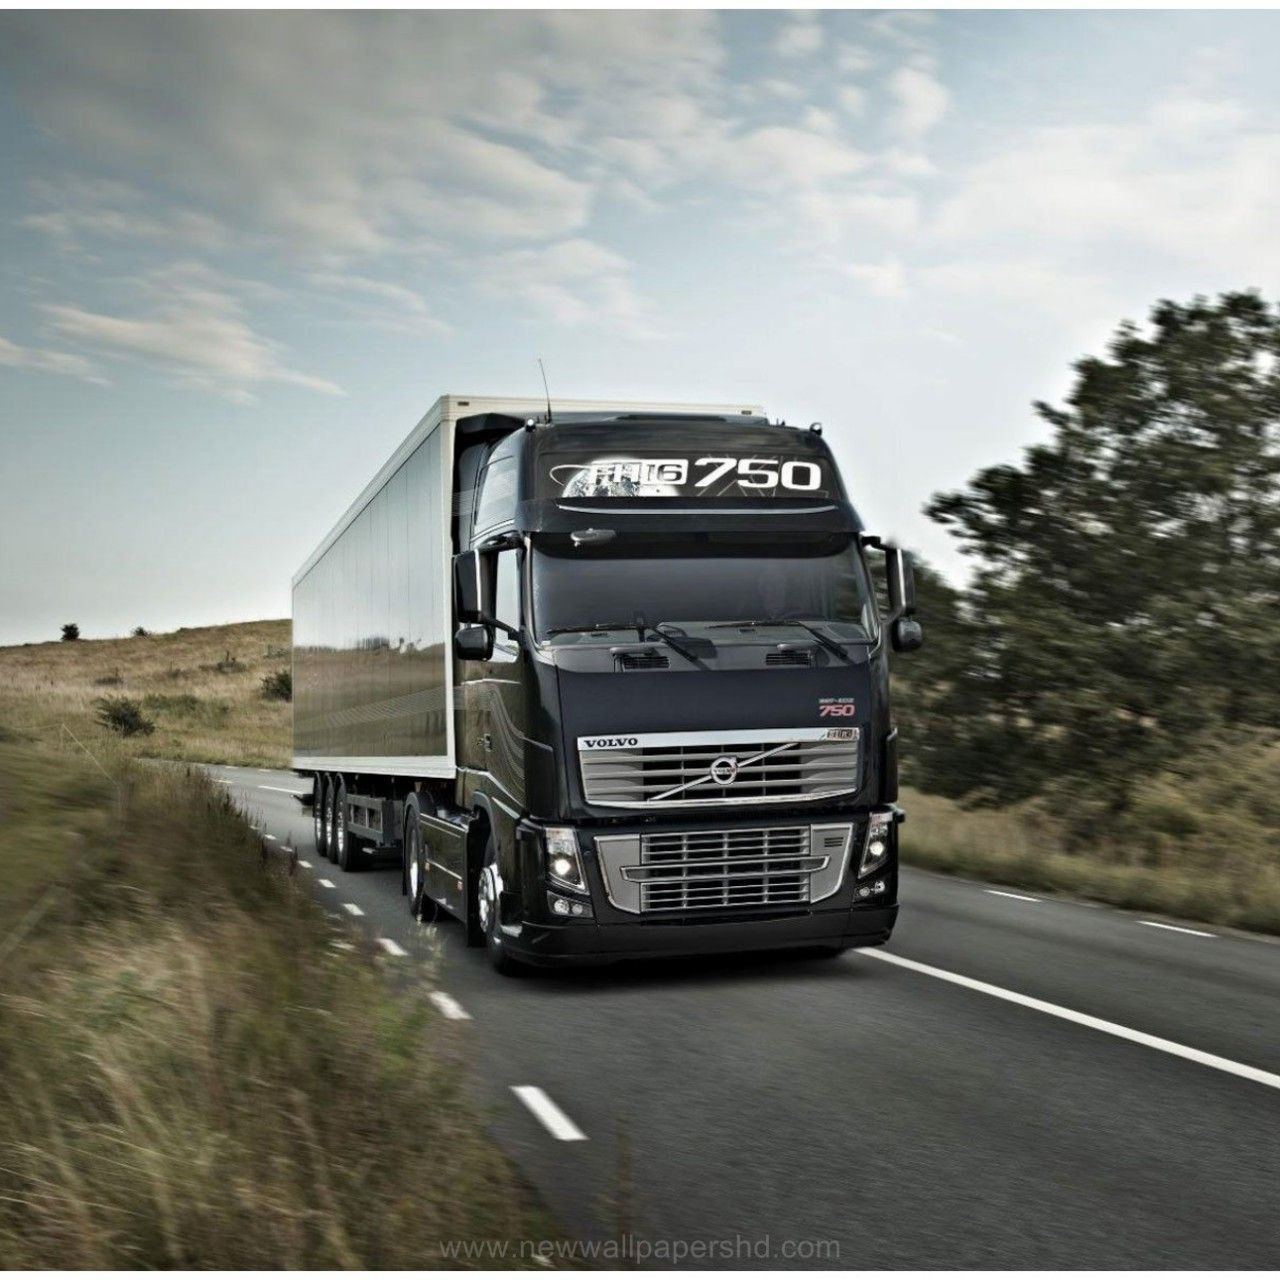 15 Best Trucks In The World Cool Trucks Pictures Volvo Trucks Trucks Volvo Absolutely stunning truck wallpapers